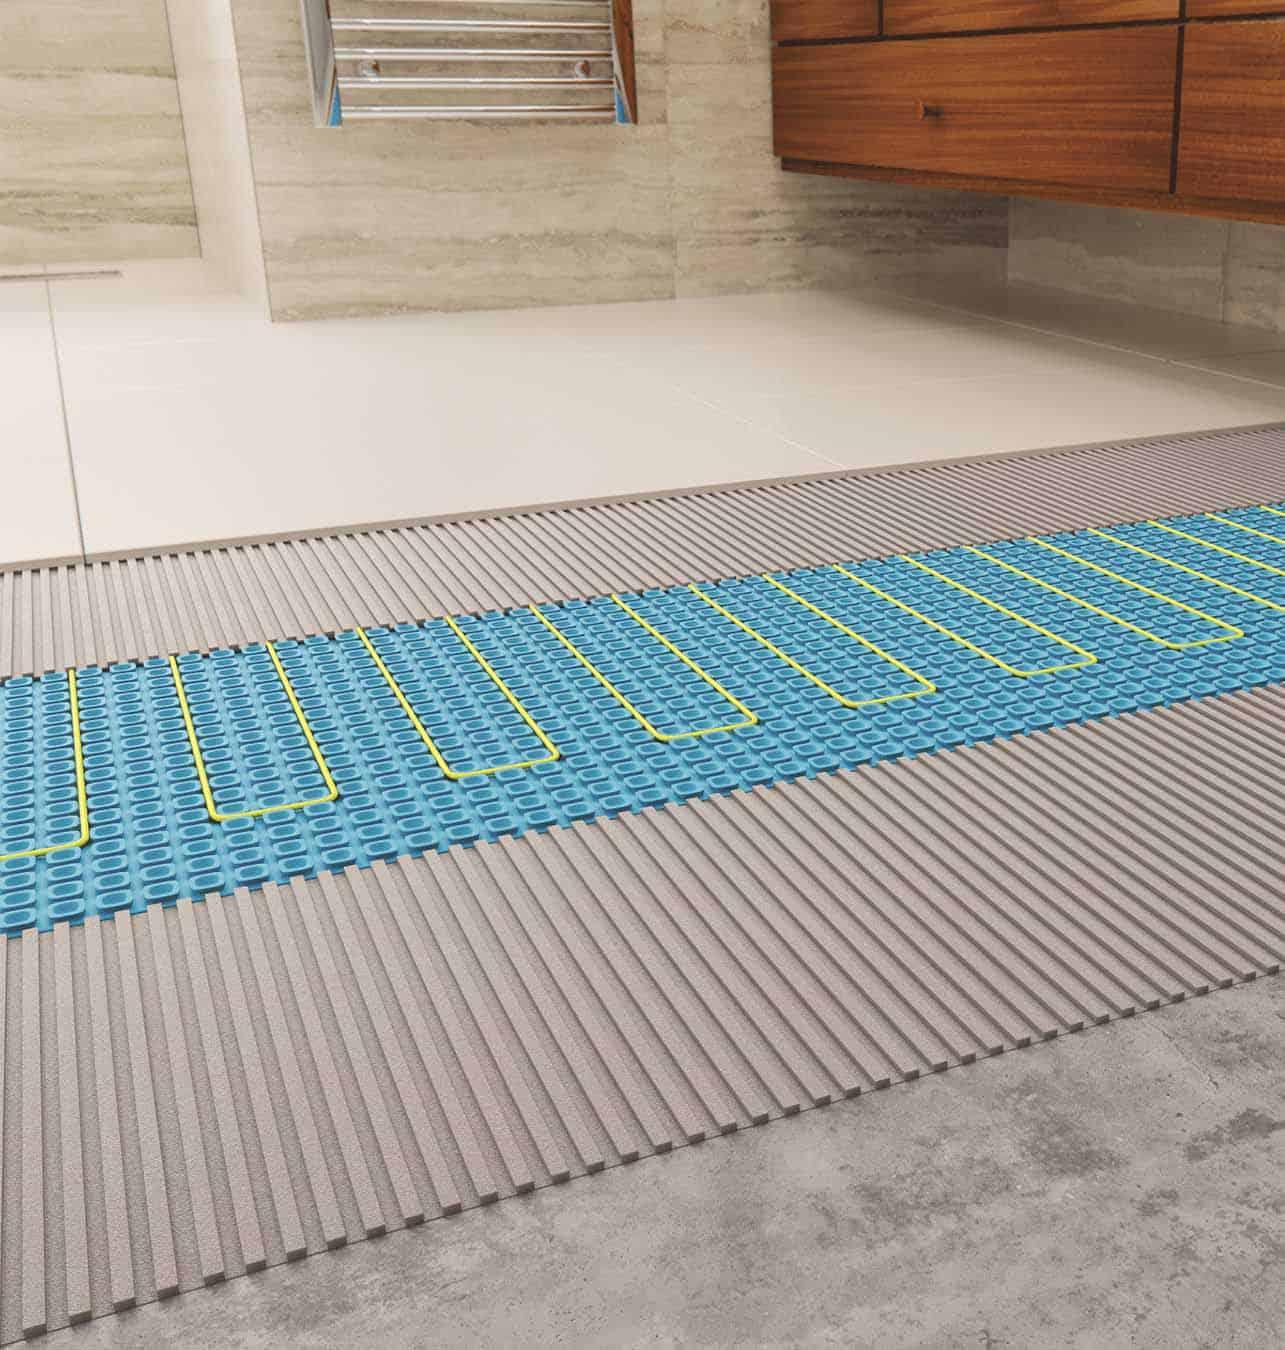 vario-pro-underfloor-heating-and-uncoupling-system